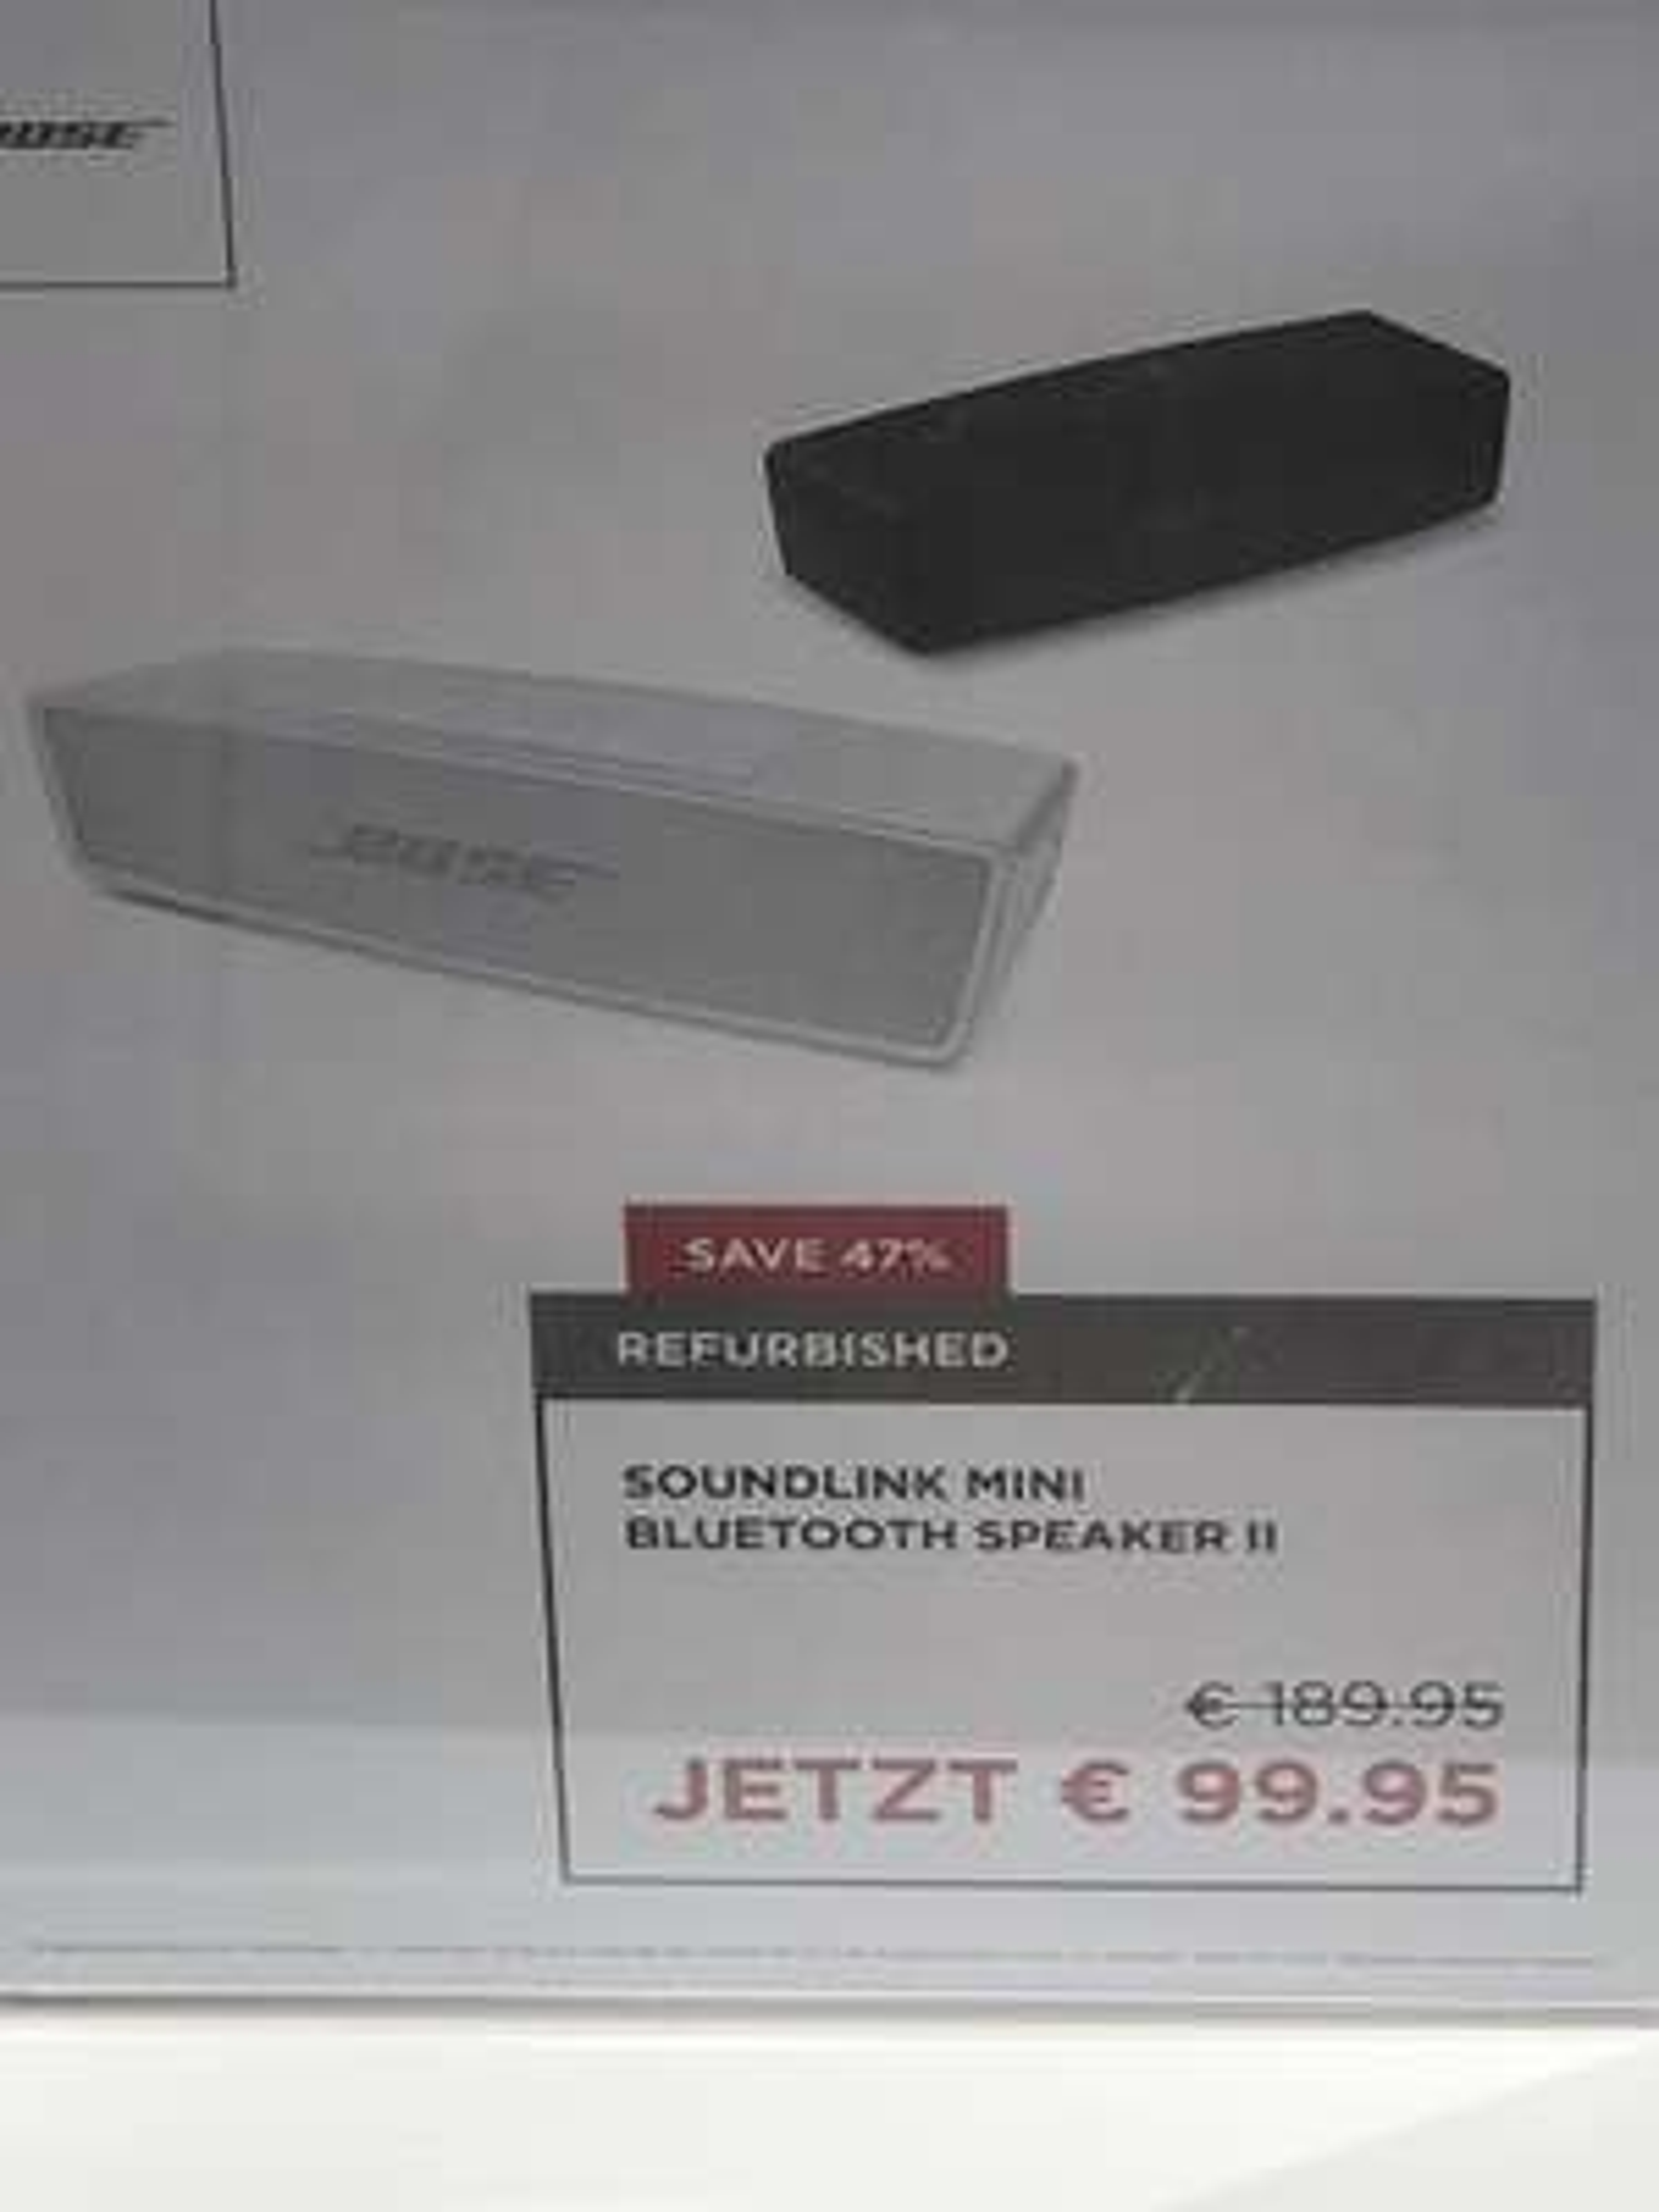 [Bose Store HH] Bose Soundlink Mini Refub.